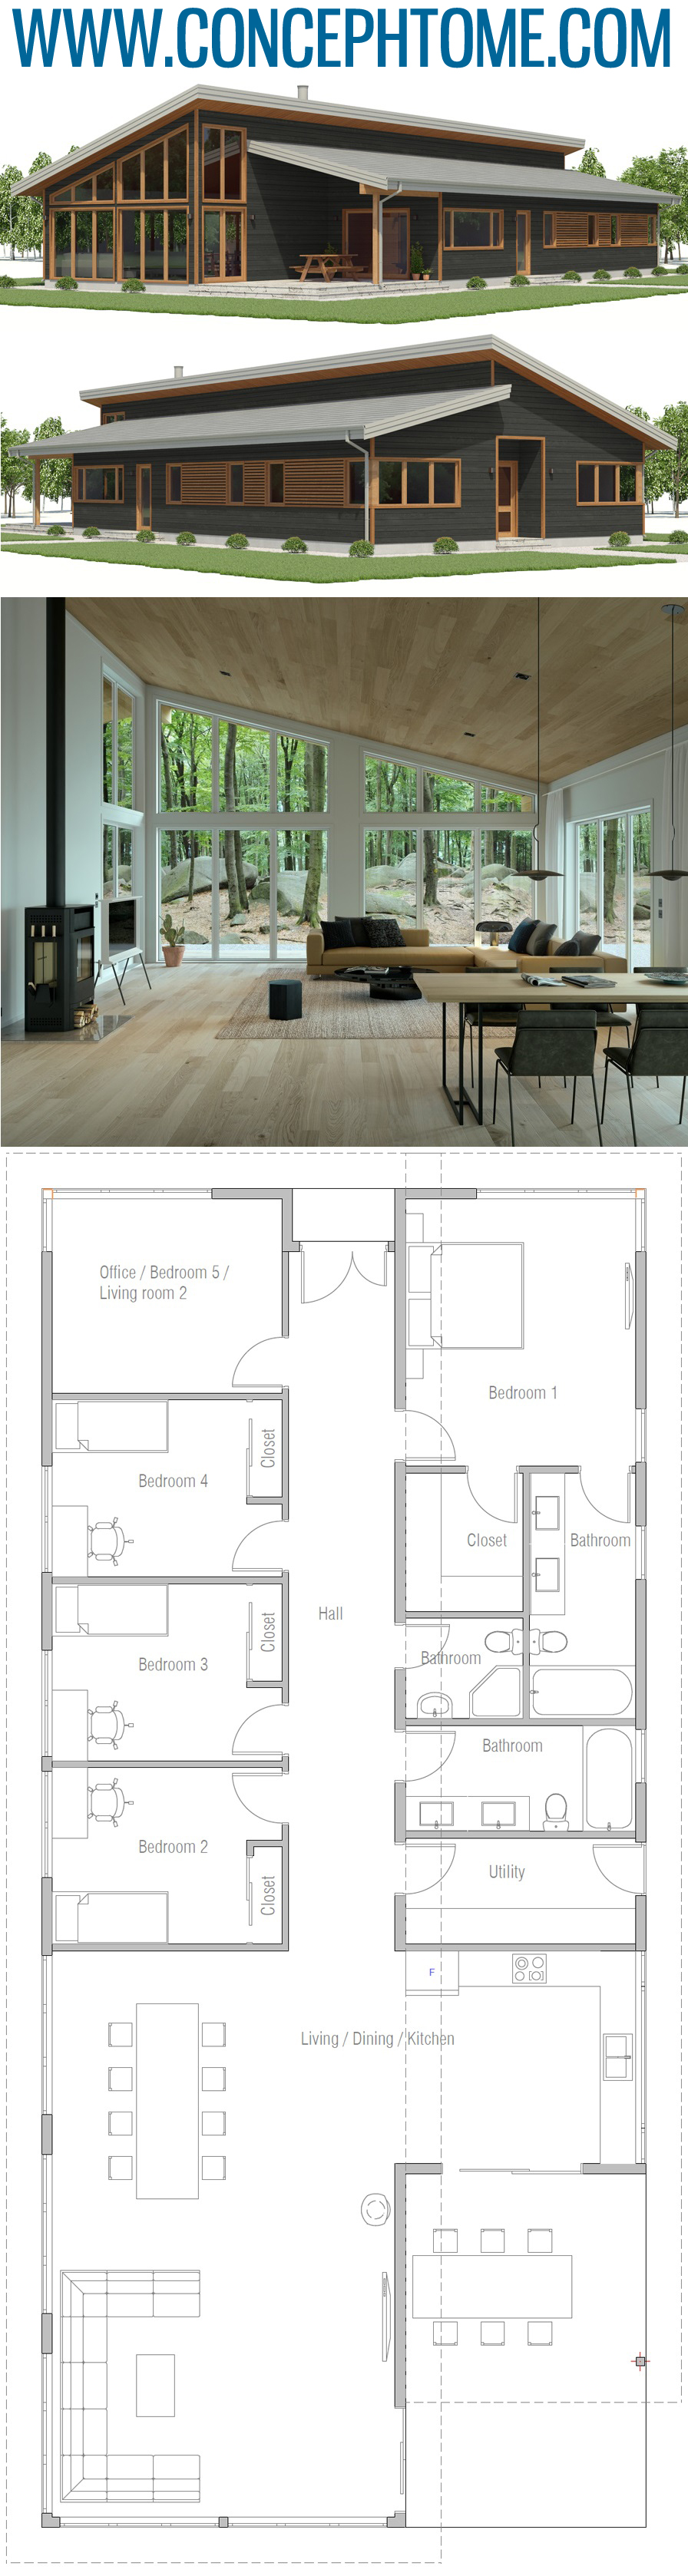 Small Home Plan Ch592 Dream House Plans Modern House Plans House Blueprints